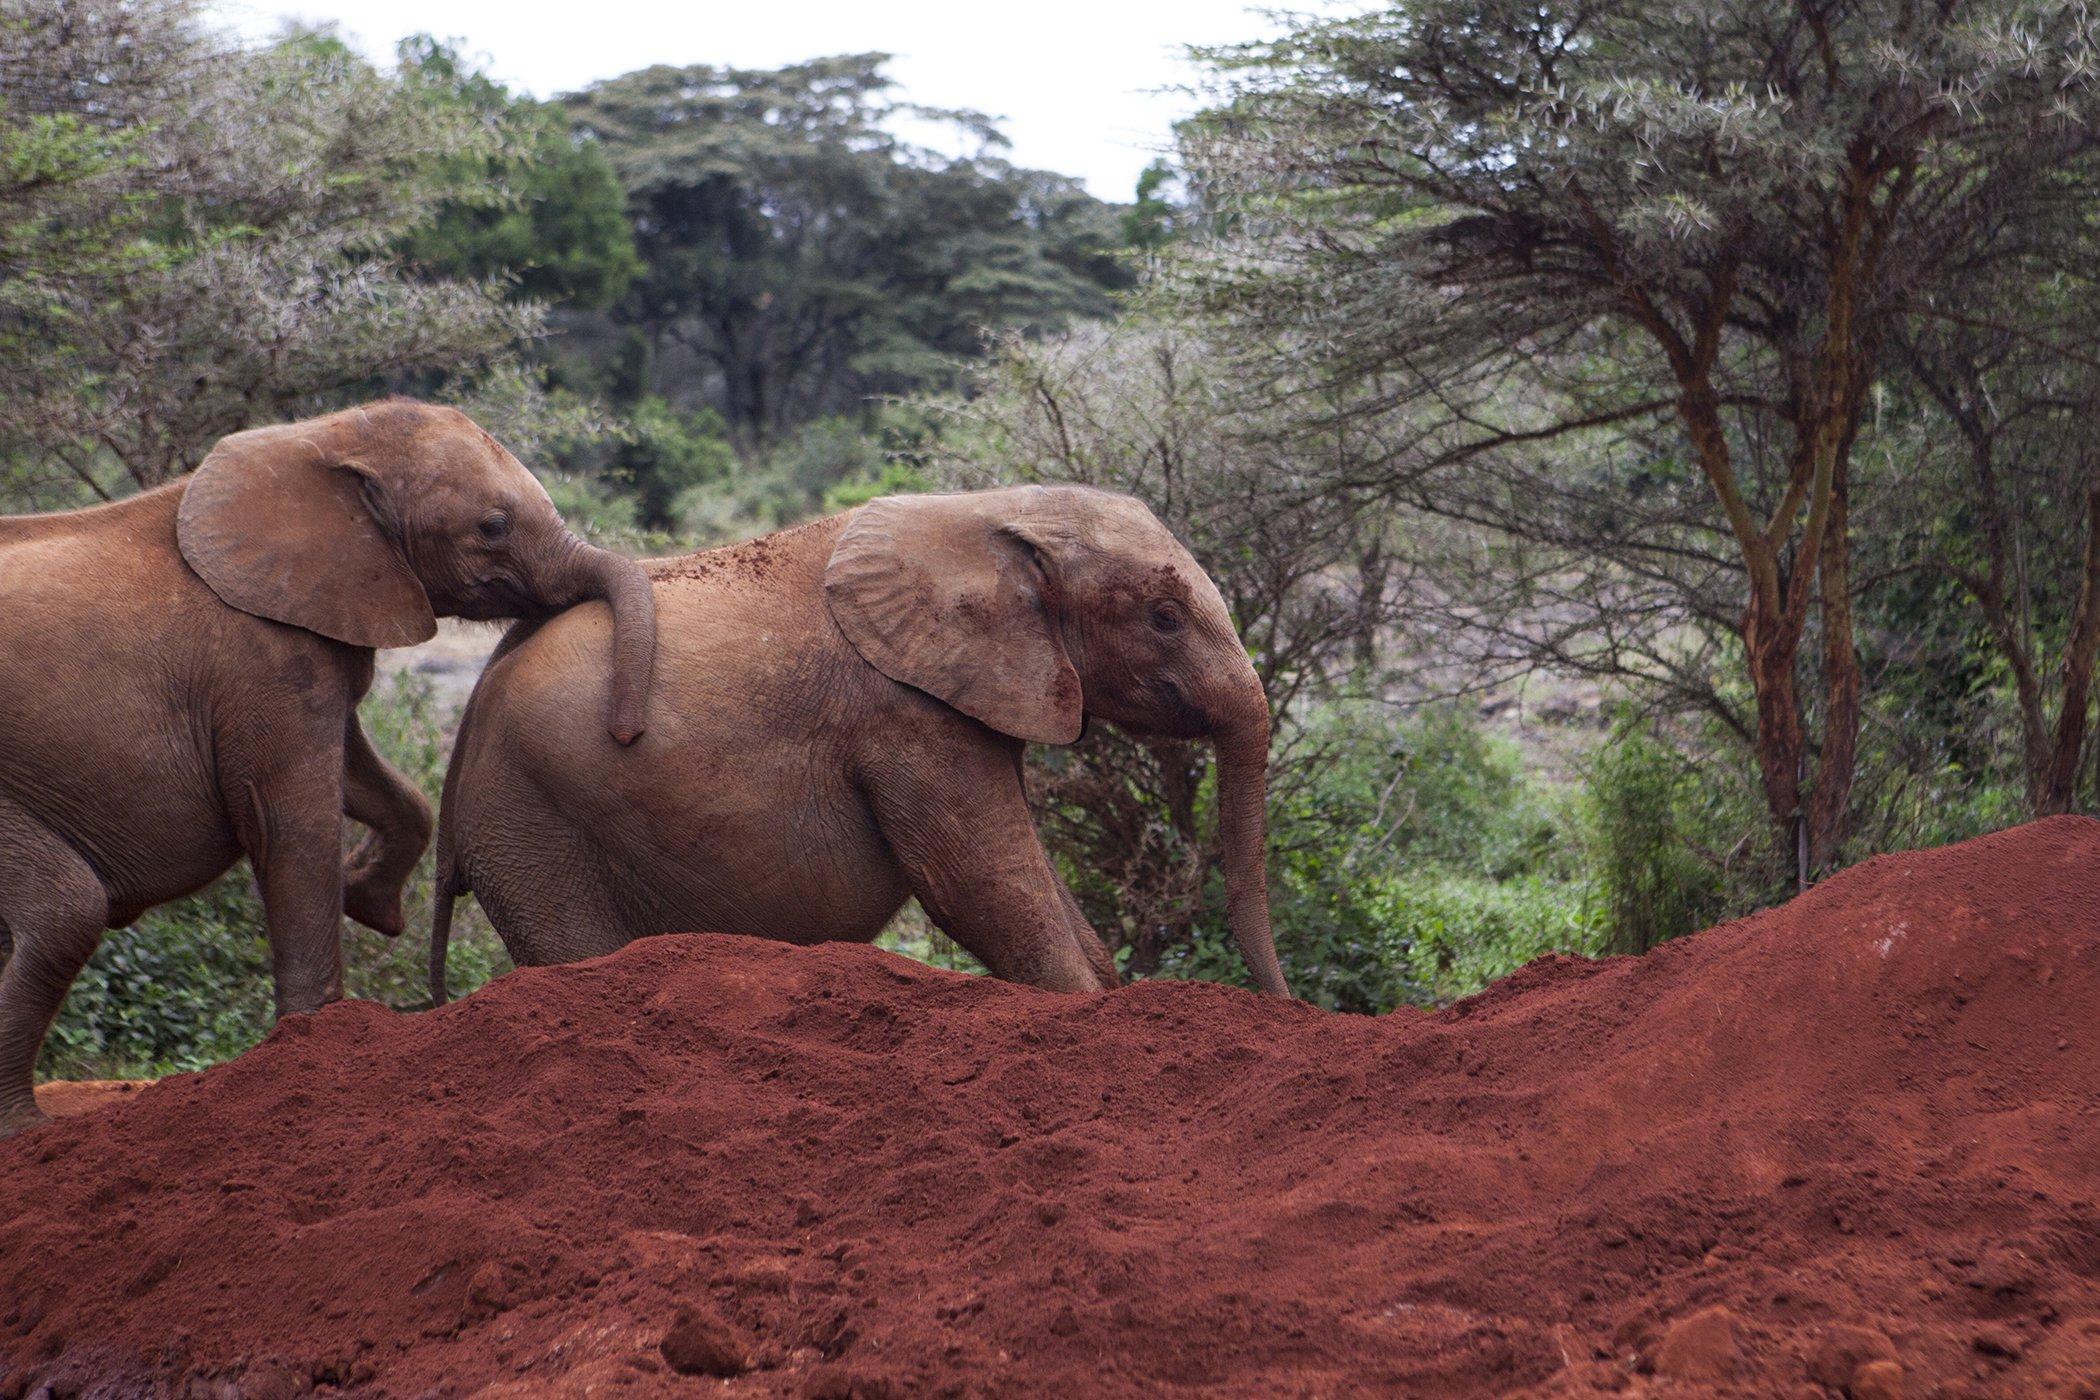 Elephant-Africa-Dani-Selby.jpg